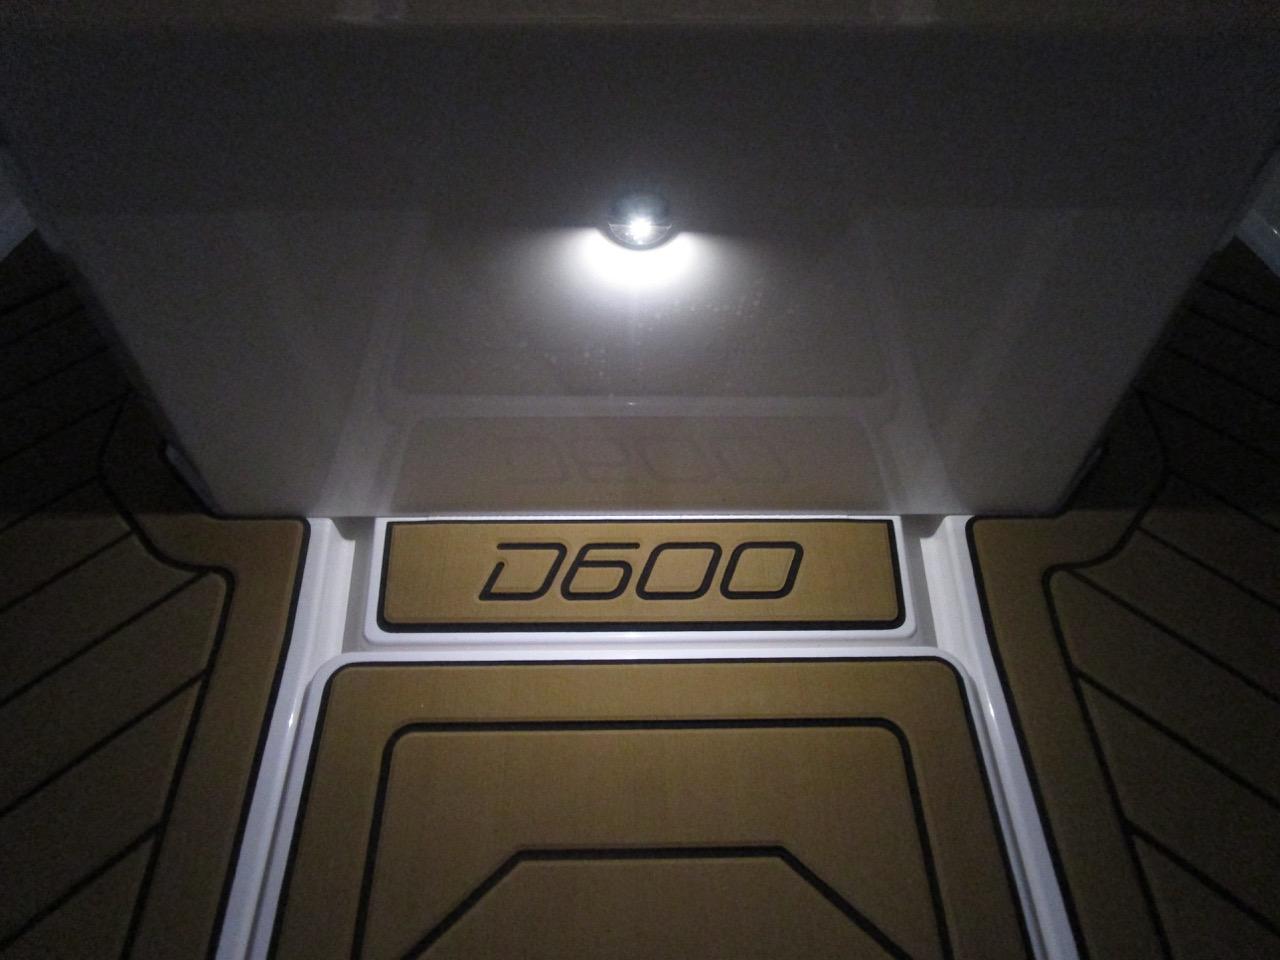 GRAND DRIVE D600 RIB LED deck lights console